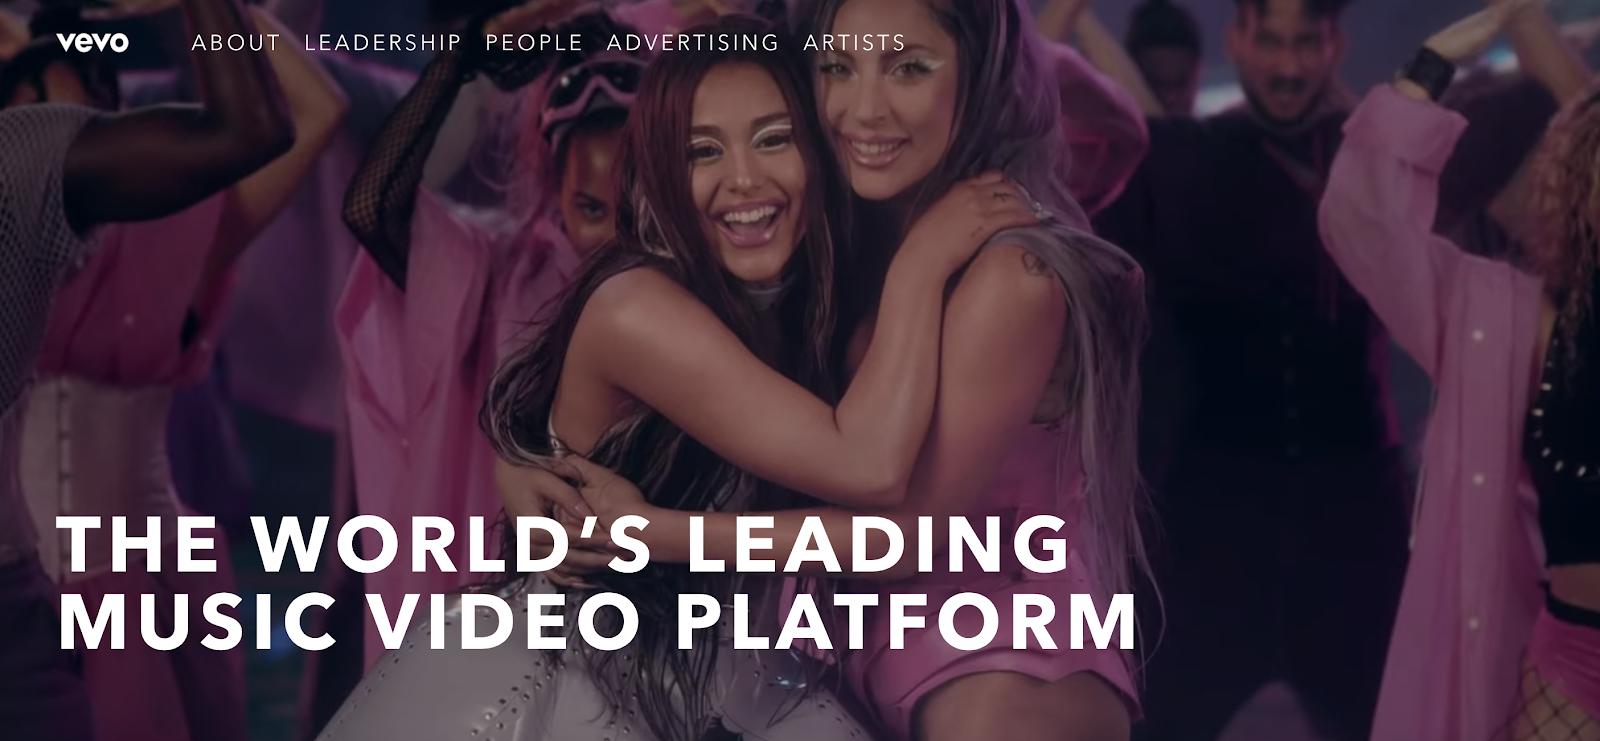 Vevo, the music video platform